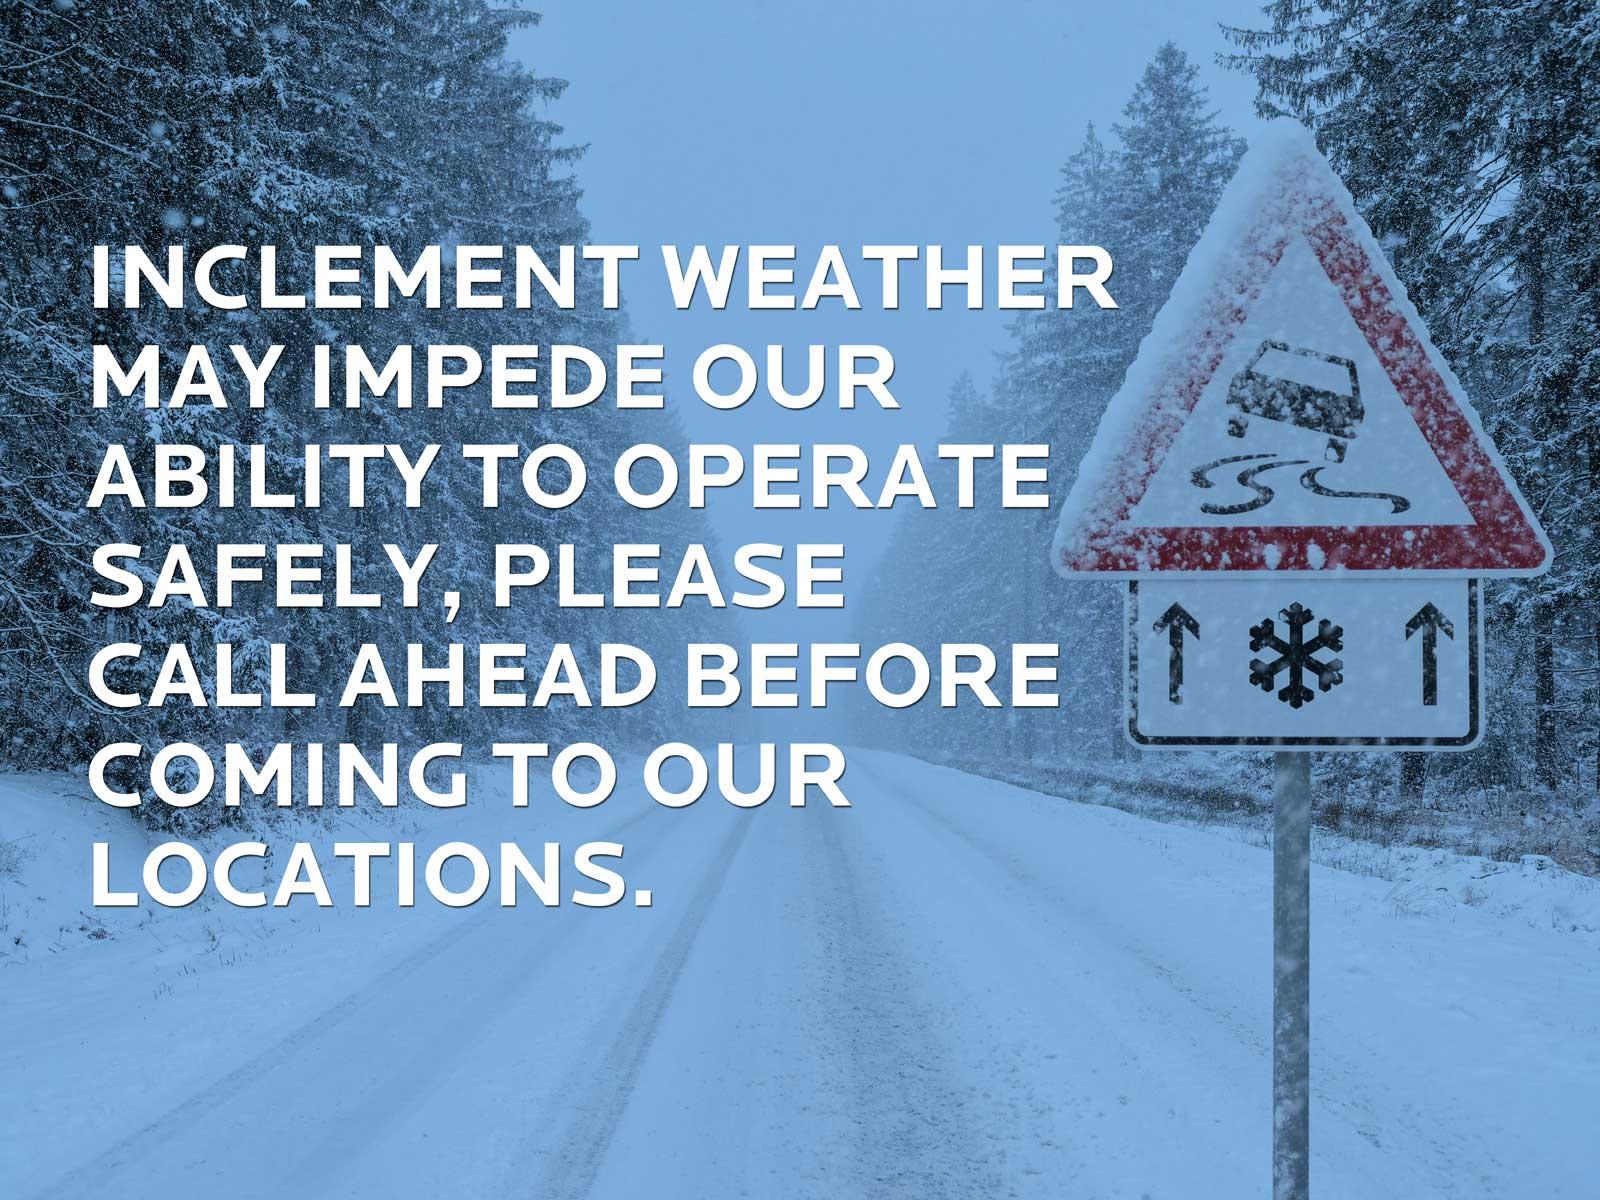 Snow warning